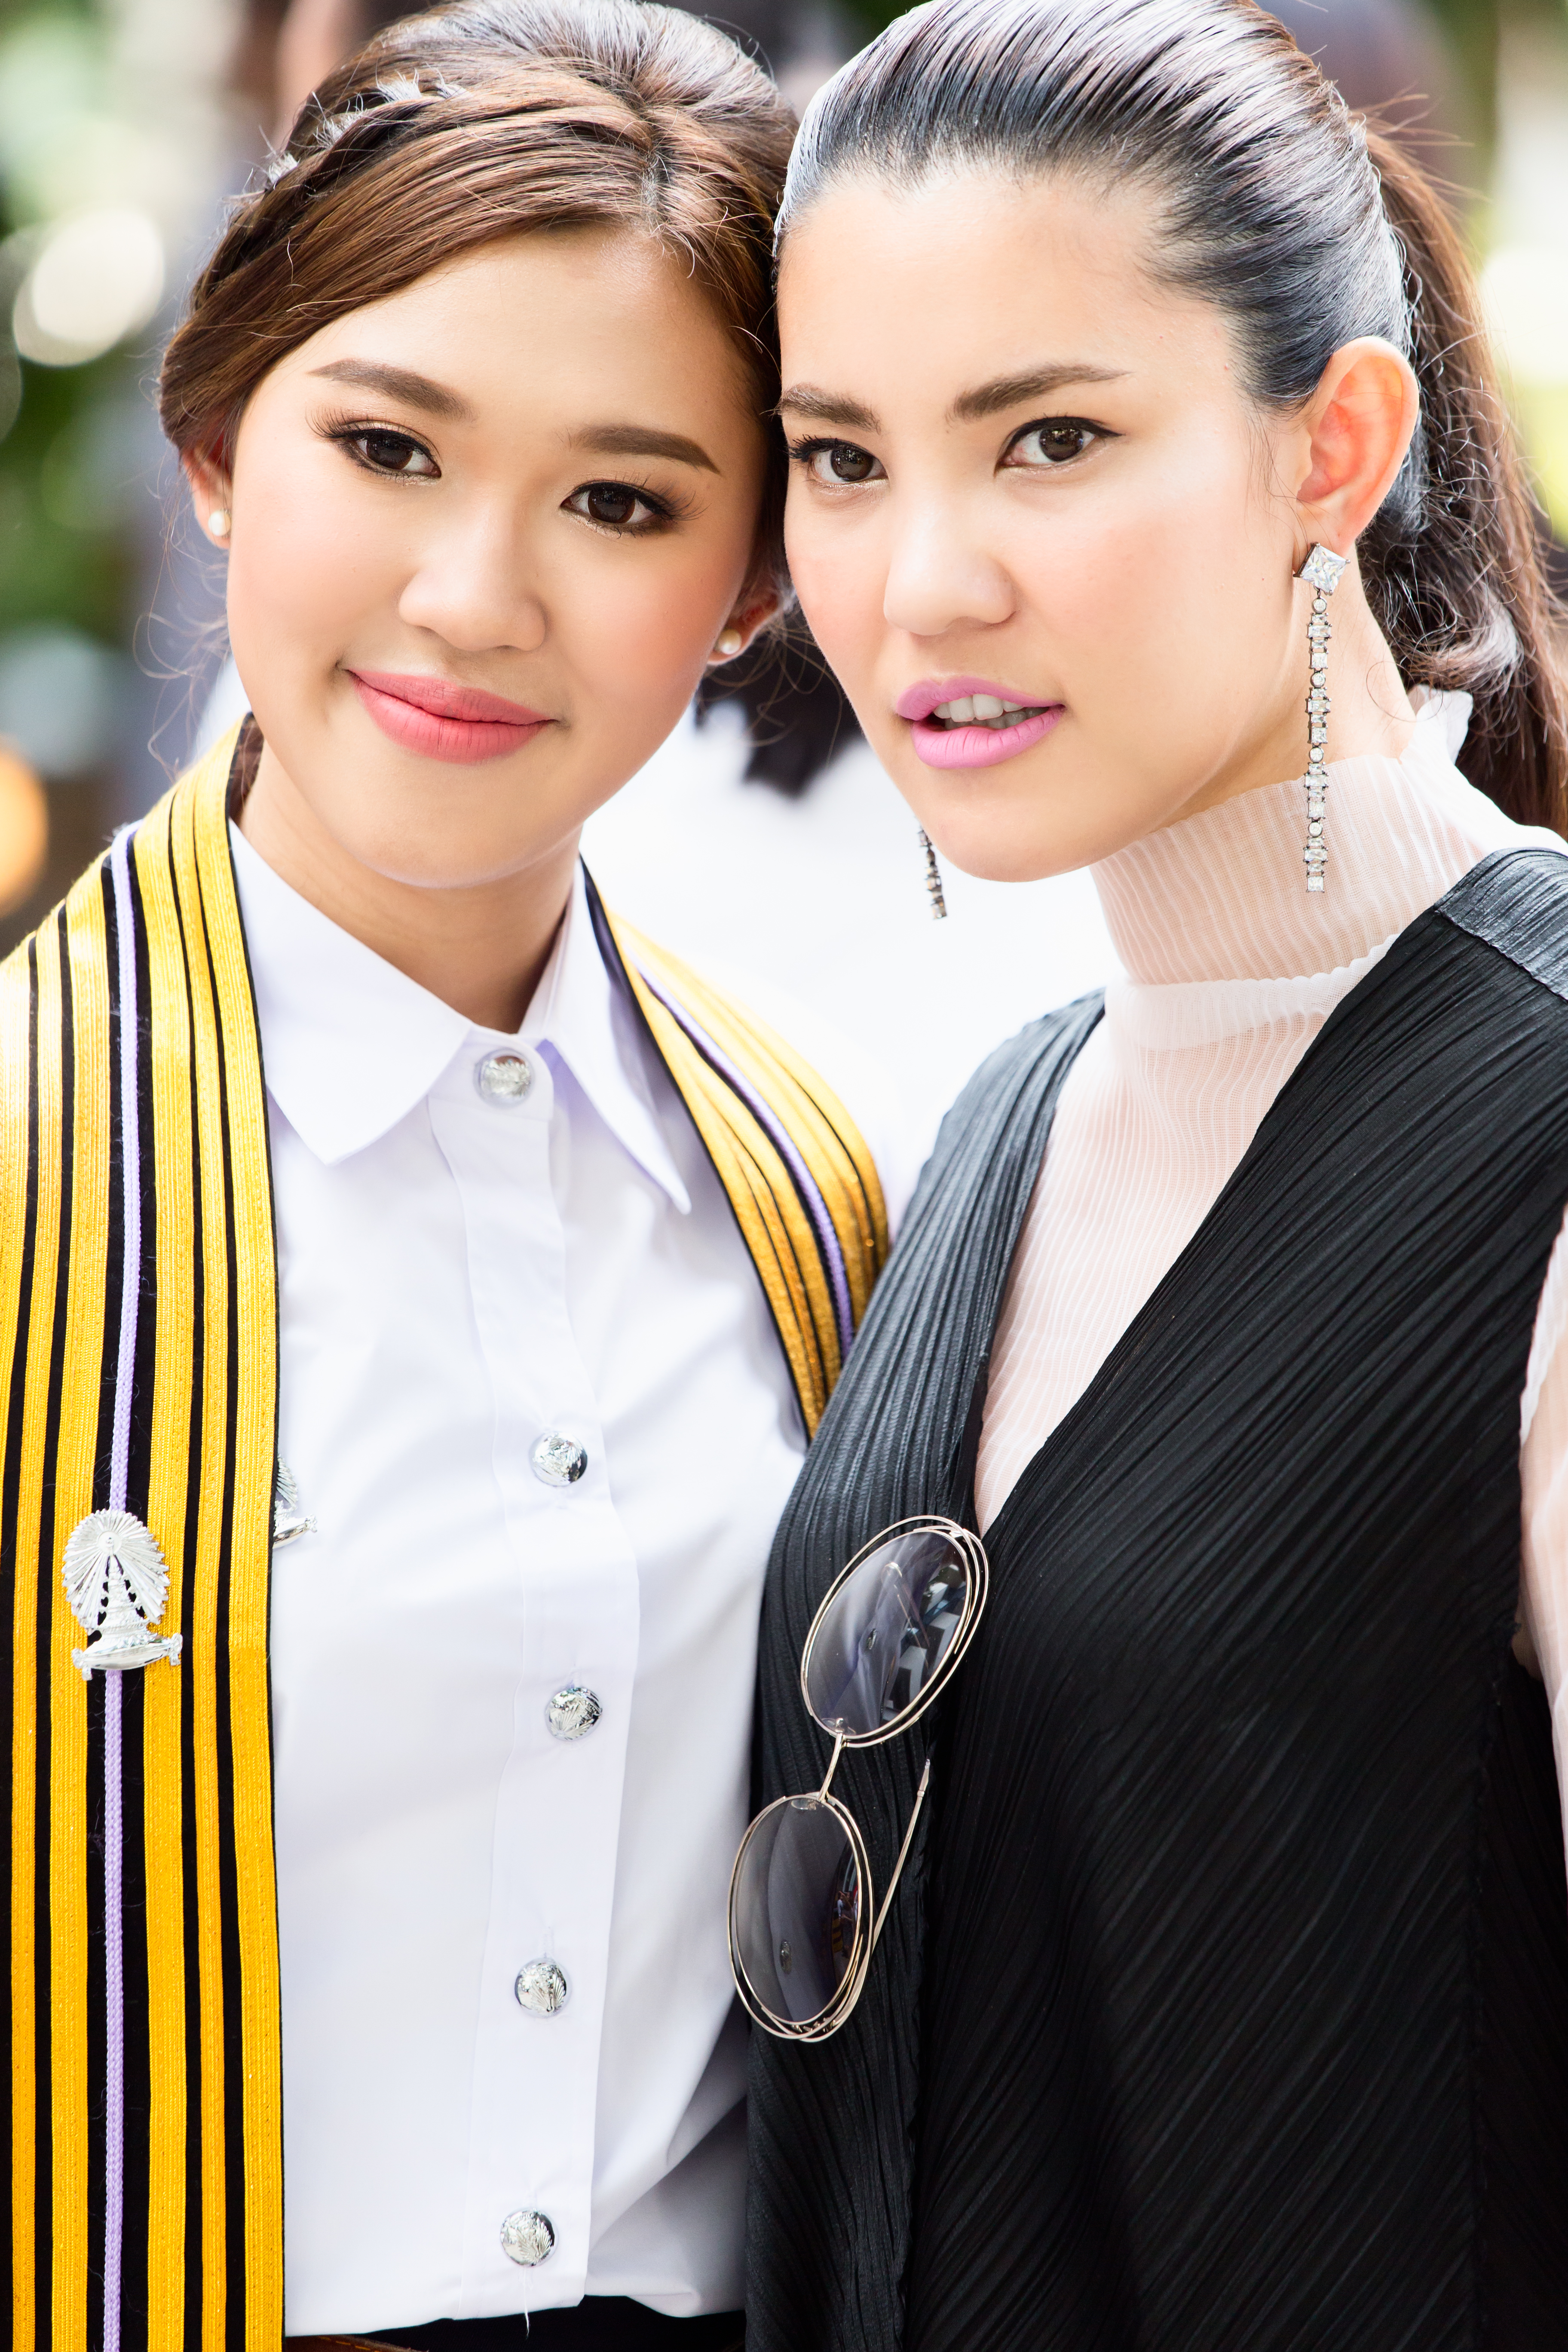 Graduation-71